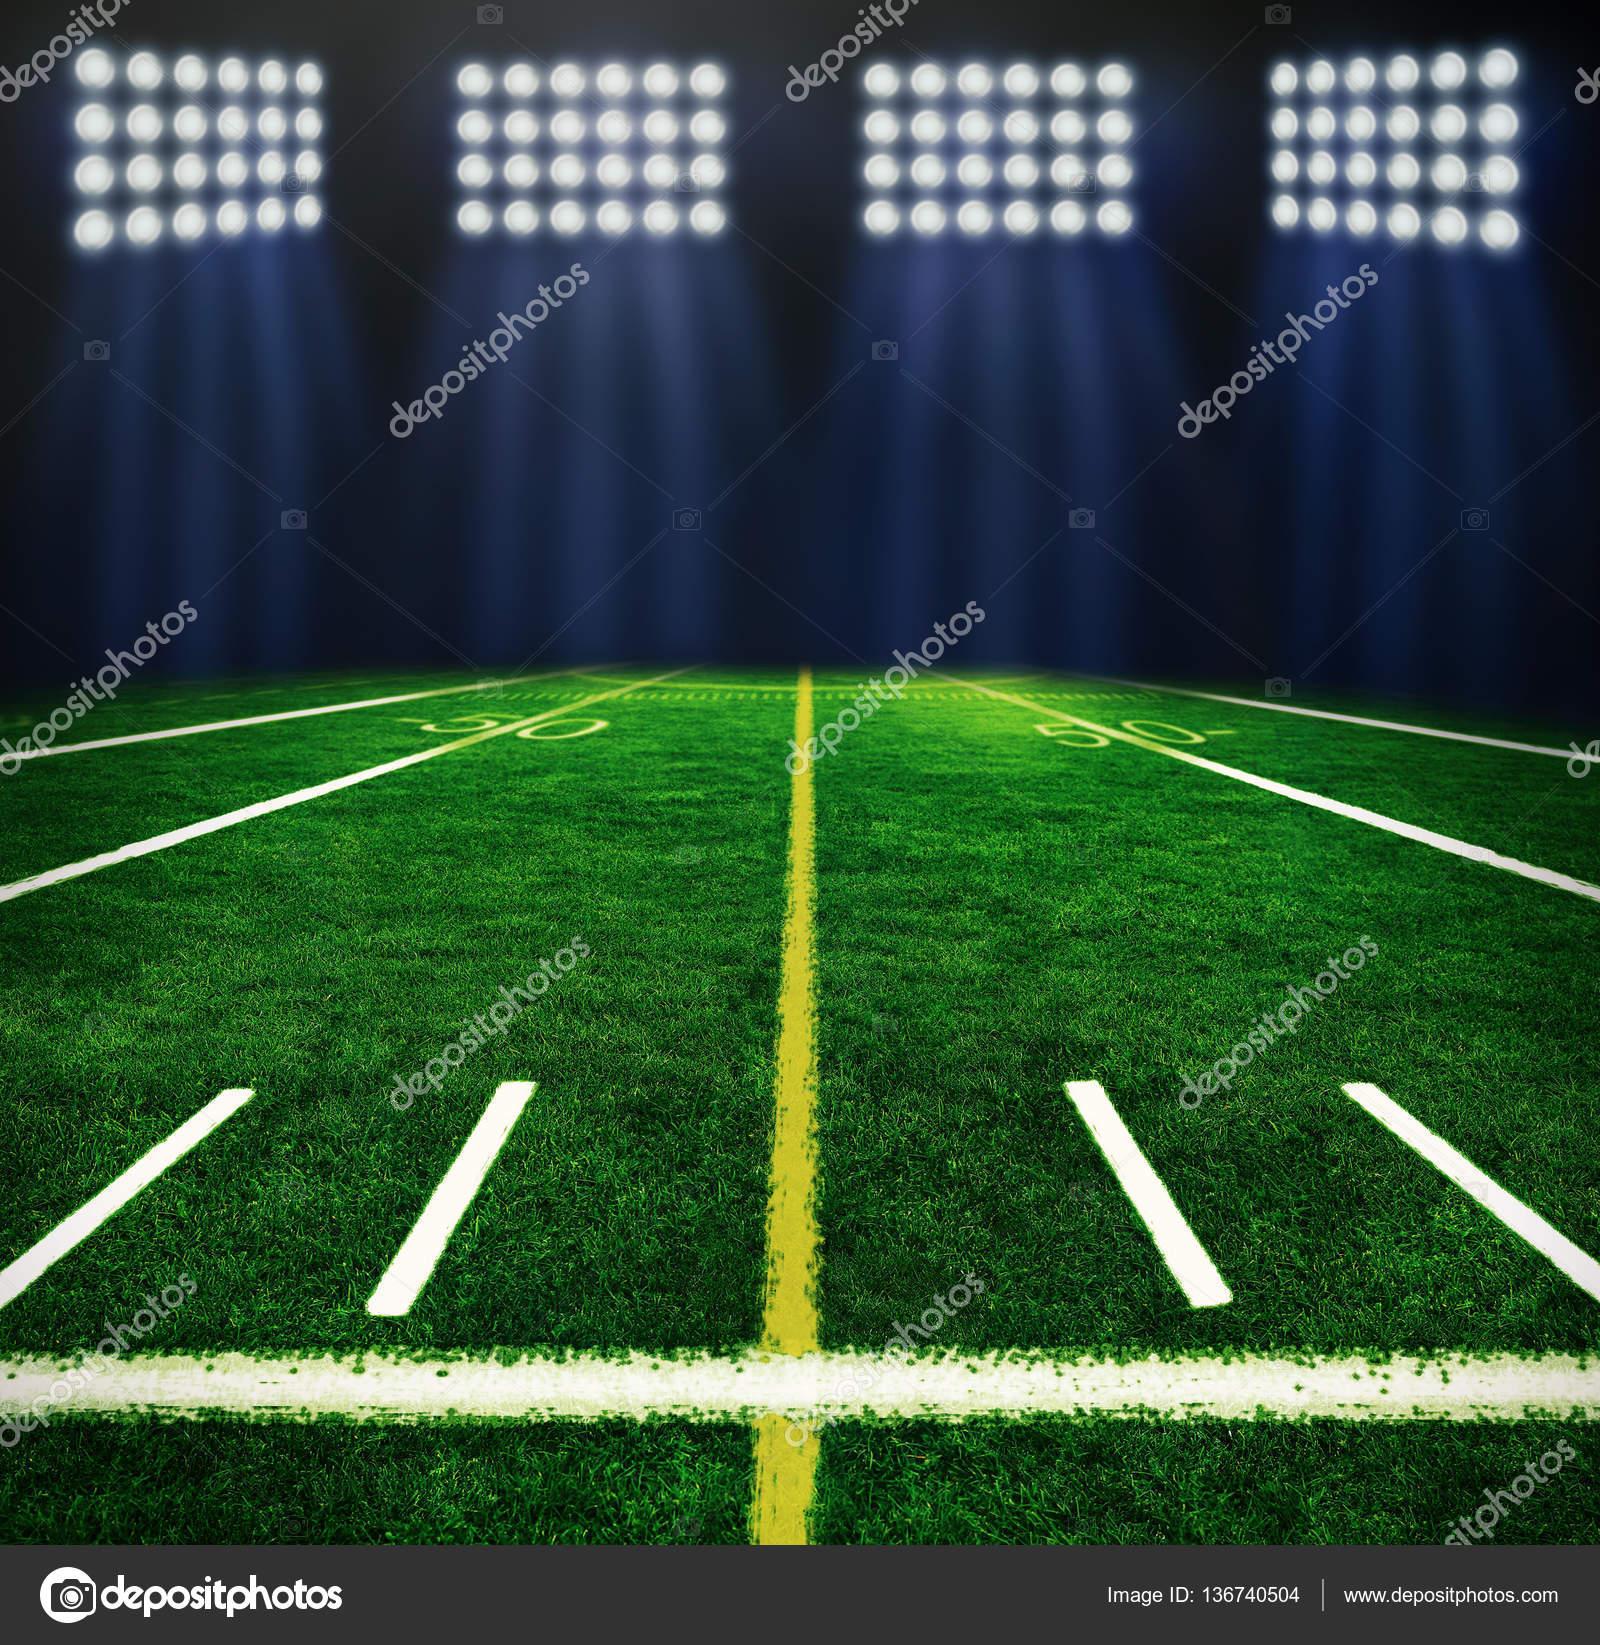 Cancha de fútbol iluminada en la noche - fotos  canchas de futbol — Foto de  belchonock — Foto de ... a1b2aa31215b2